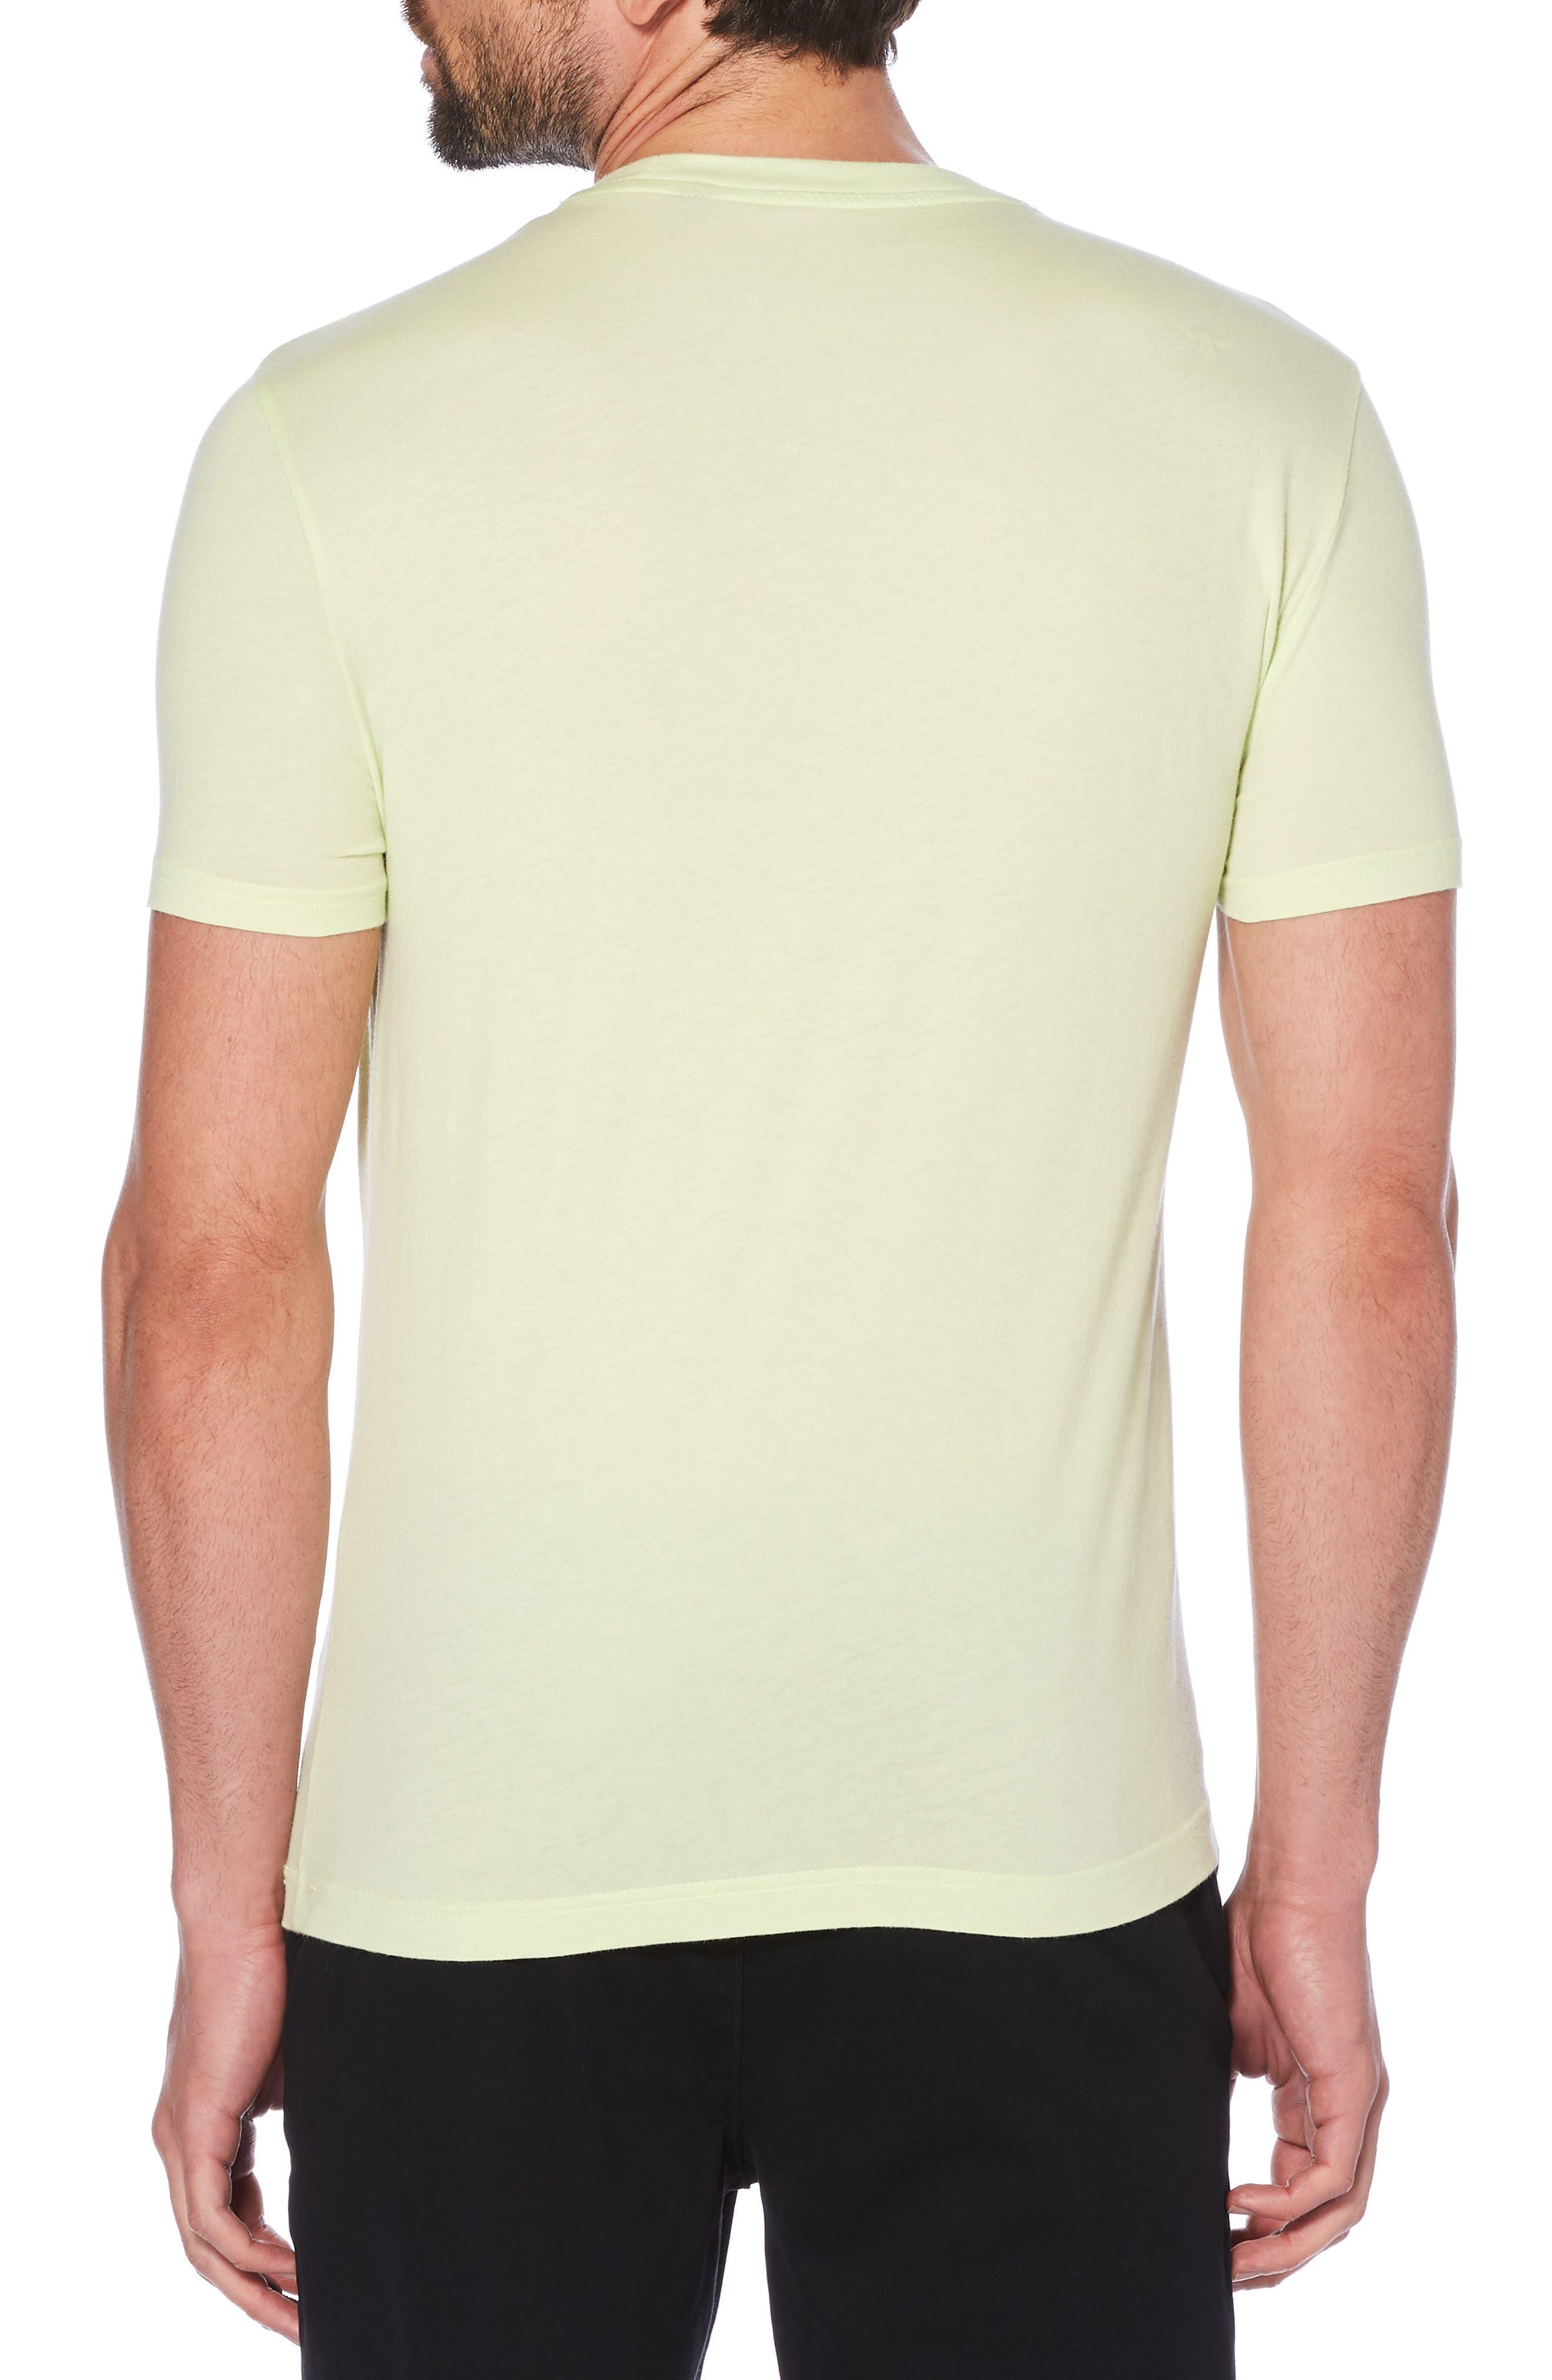 Treat Yo Self T-Shirt,                             Alternate thumbnail 4, color,